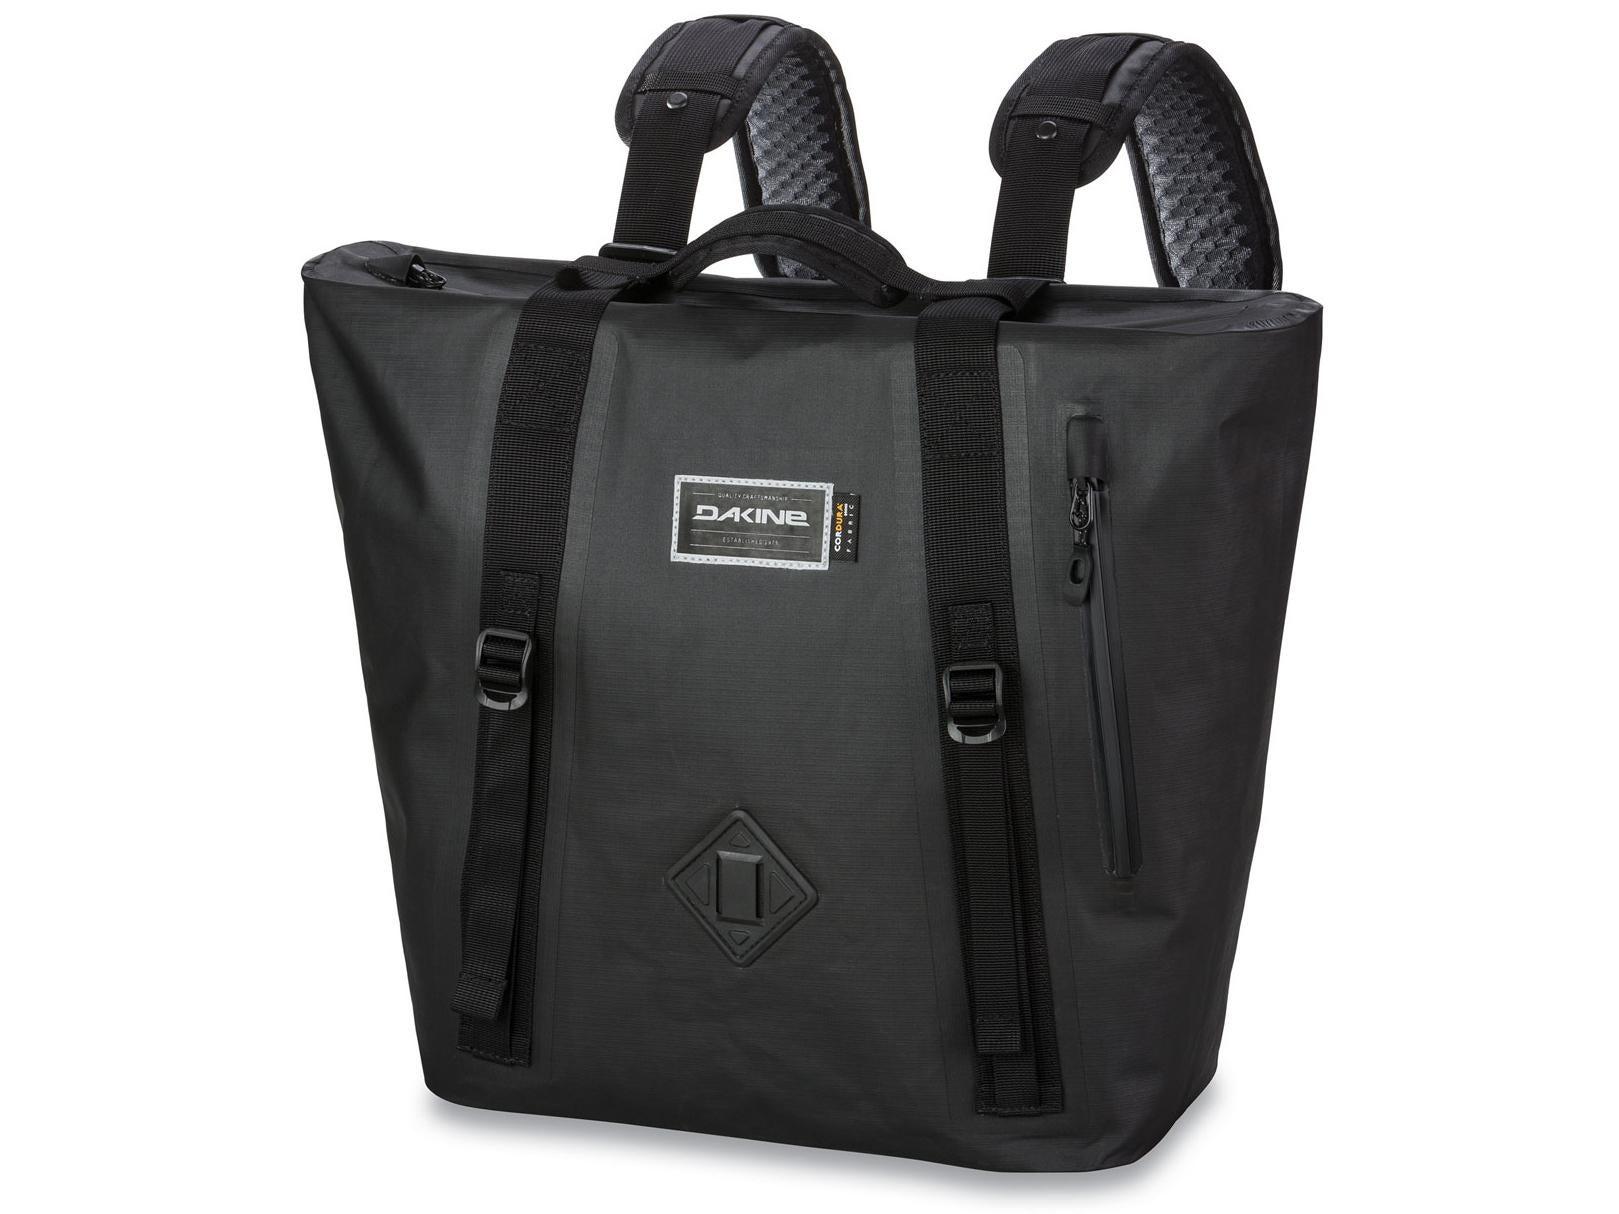 7 best swim bags  604cf22fde1d1